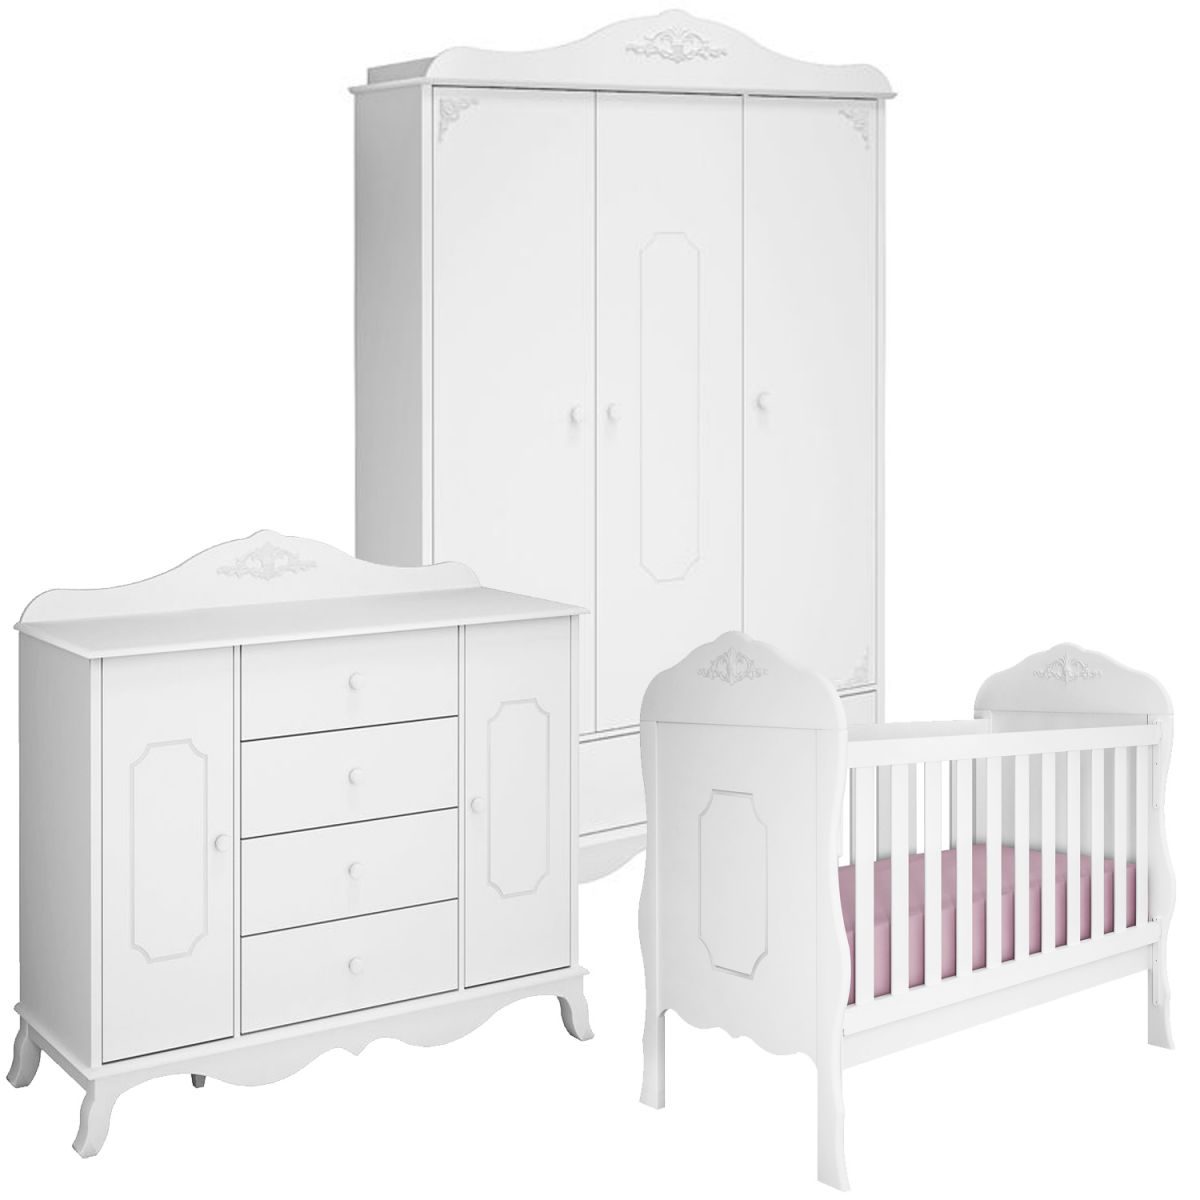 Quarto Infantil Completo Realeza Provencal 3 Portas E Berco Mini Cama